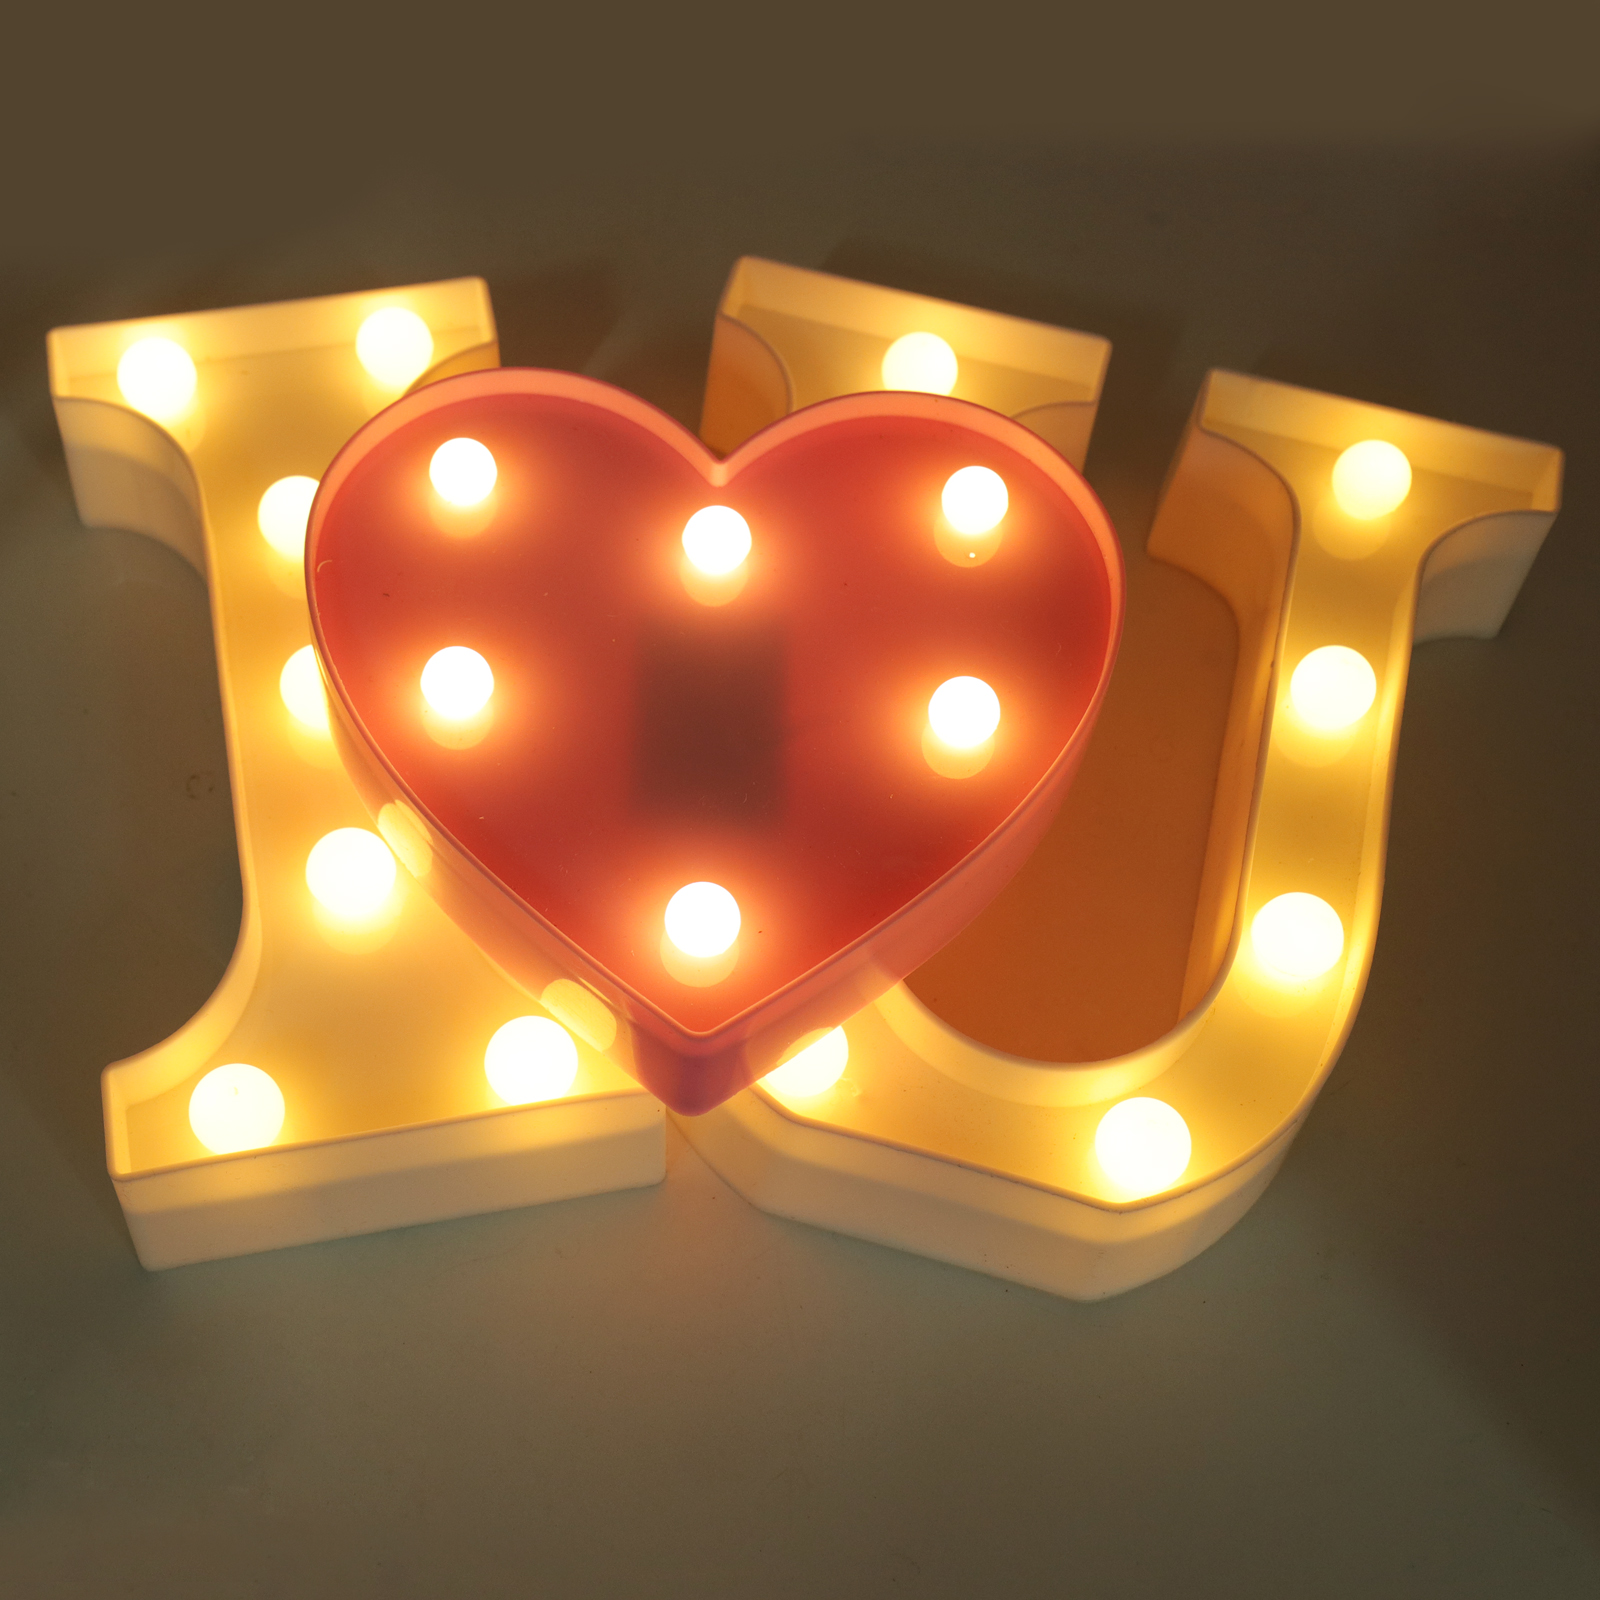 Led Symbol Modeling Lights Wedding Night Light Wedding Party